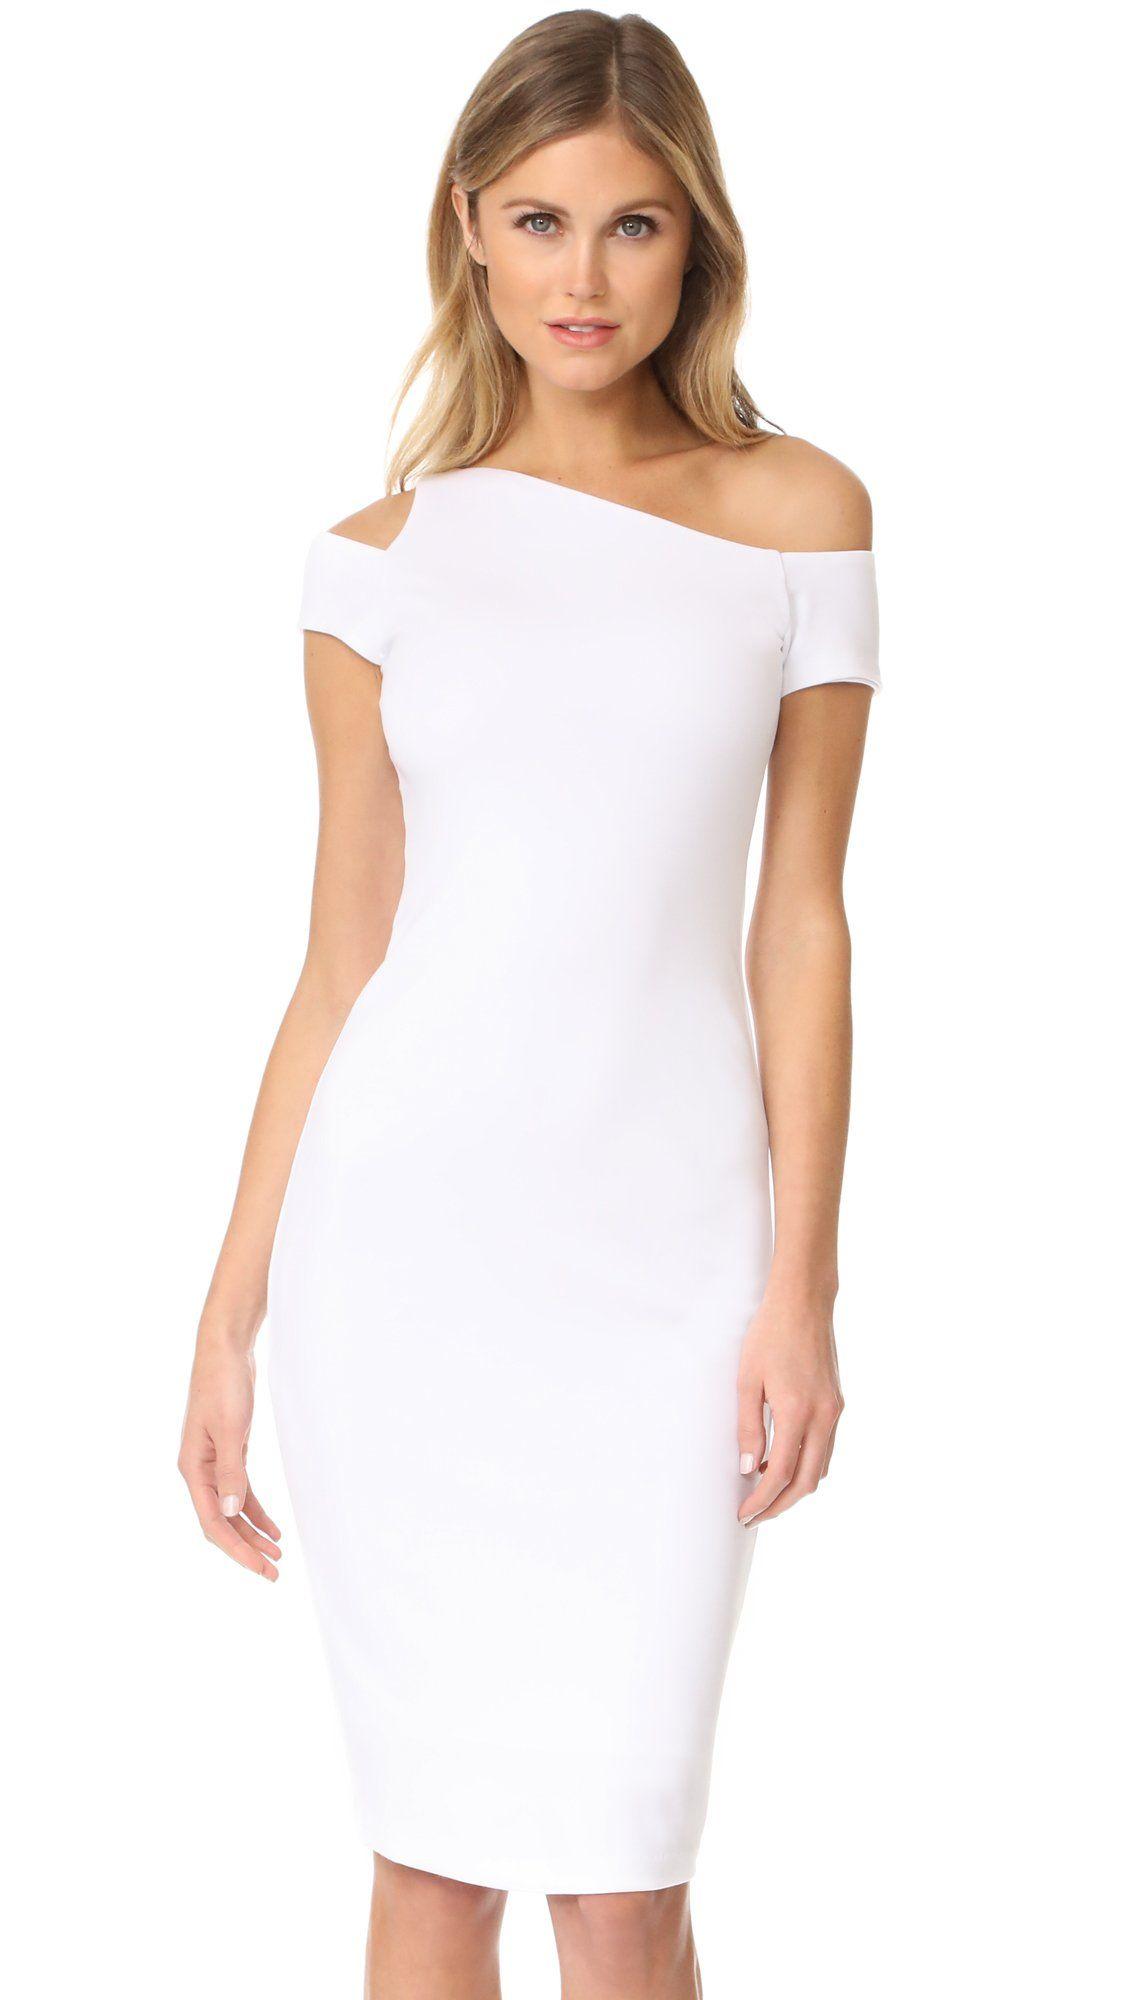 Bailey womenus caribbean dress white xsmall apparel